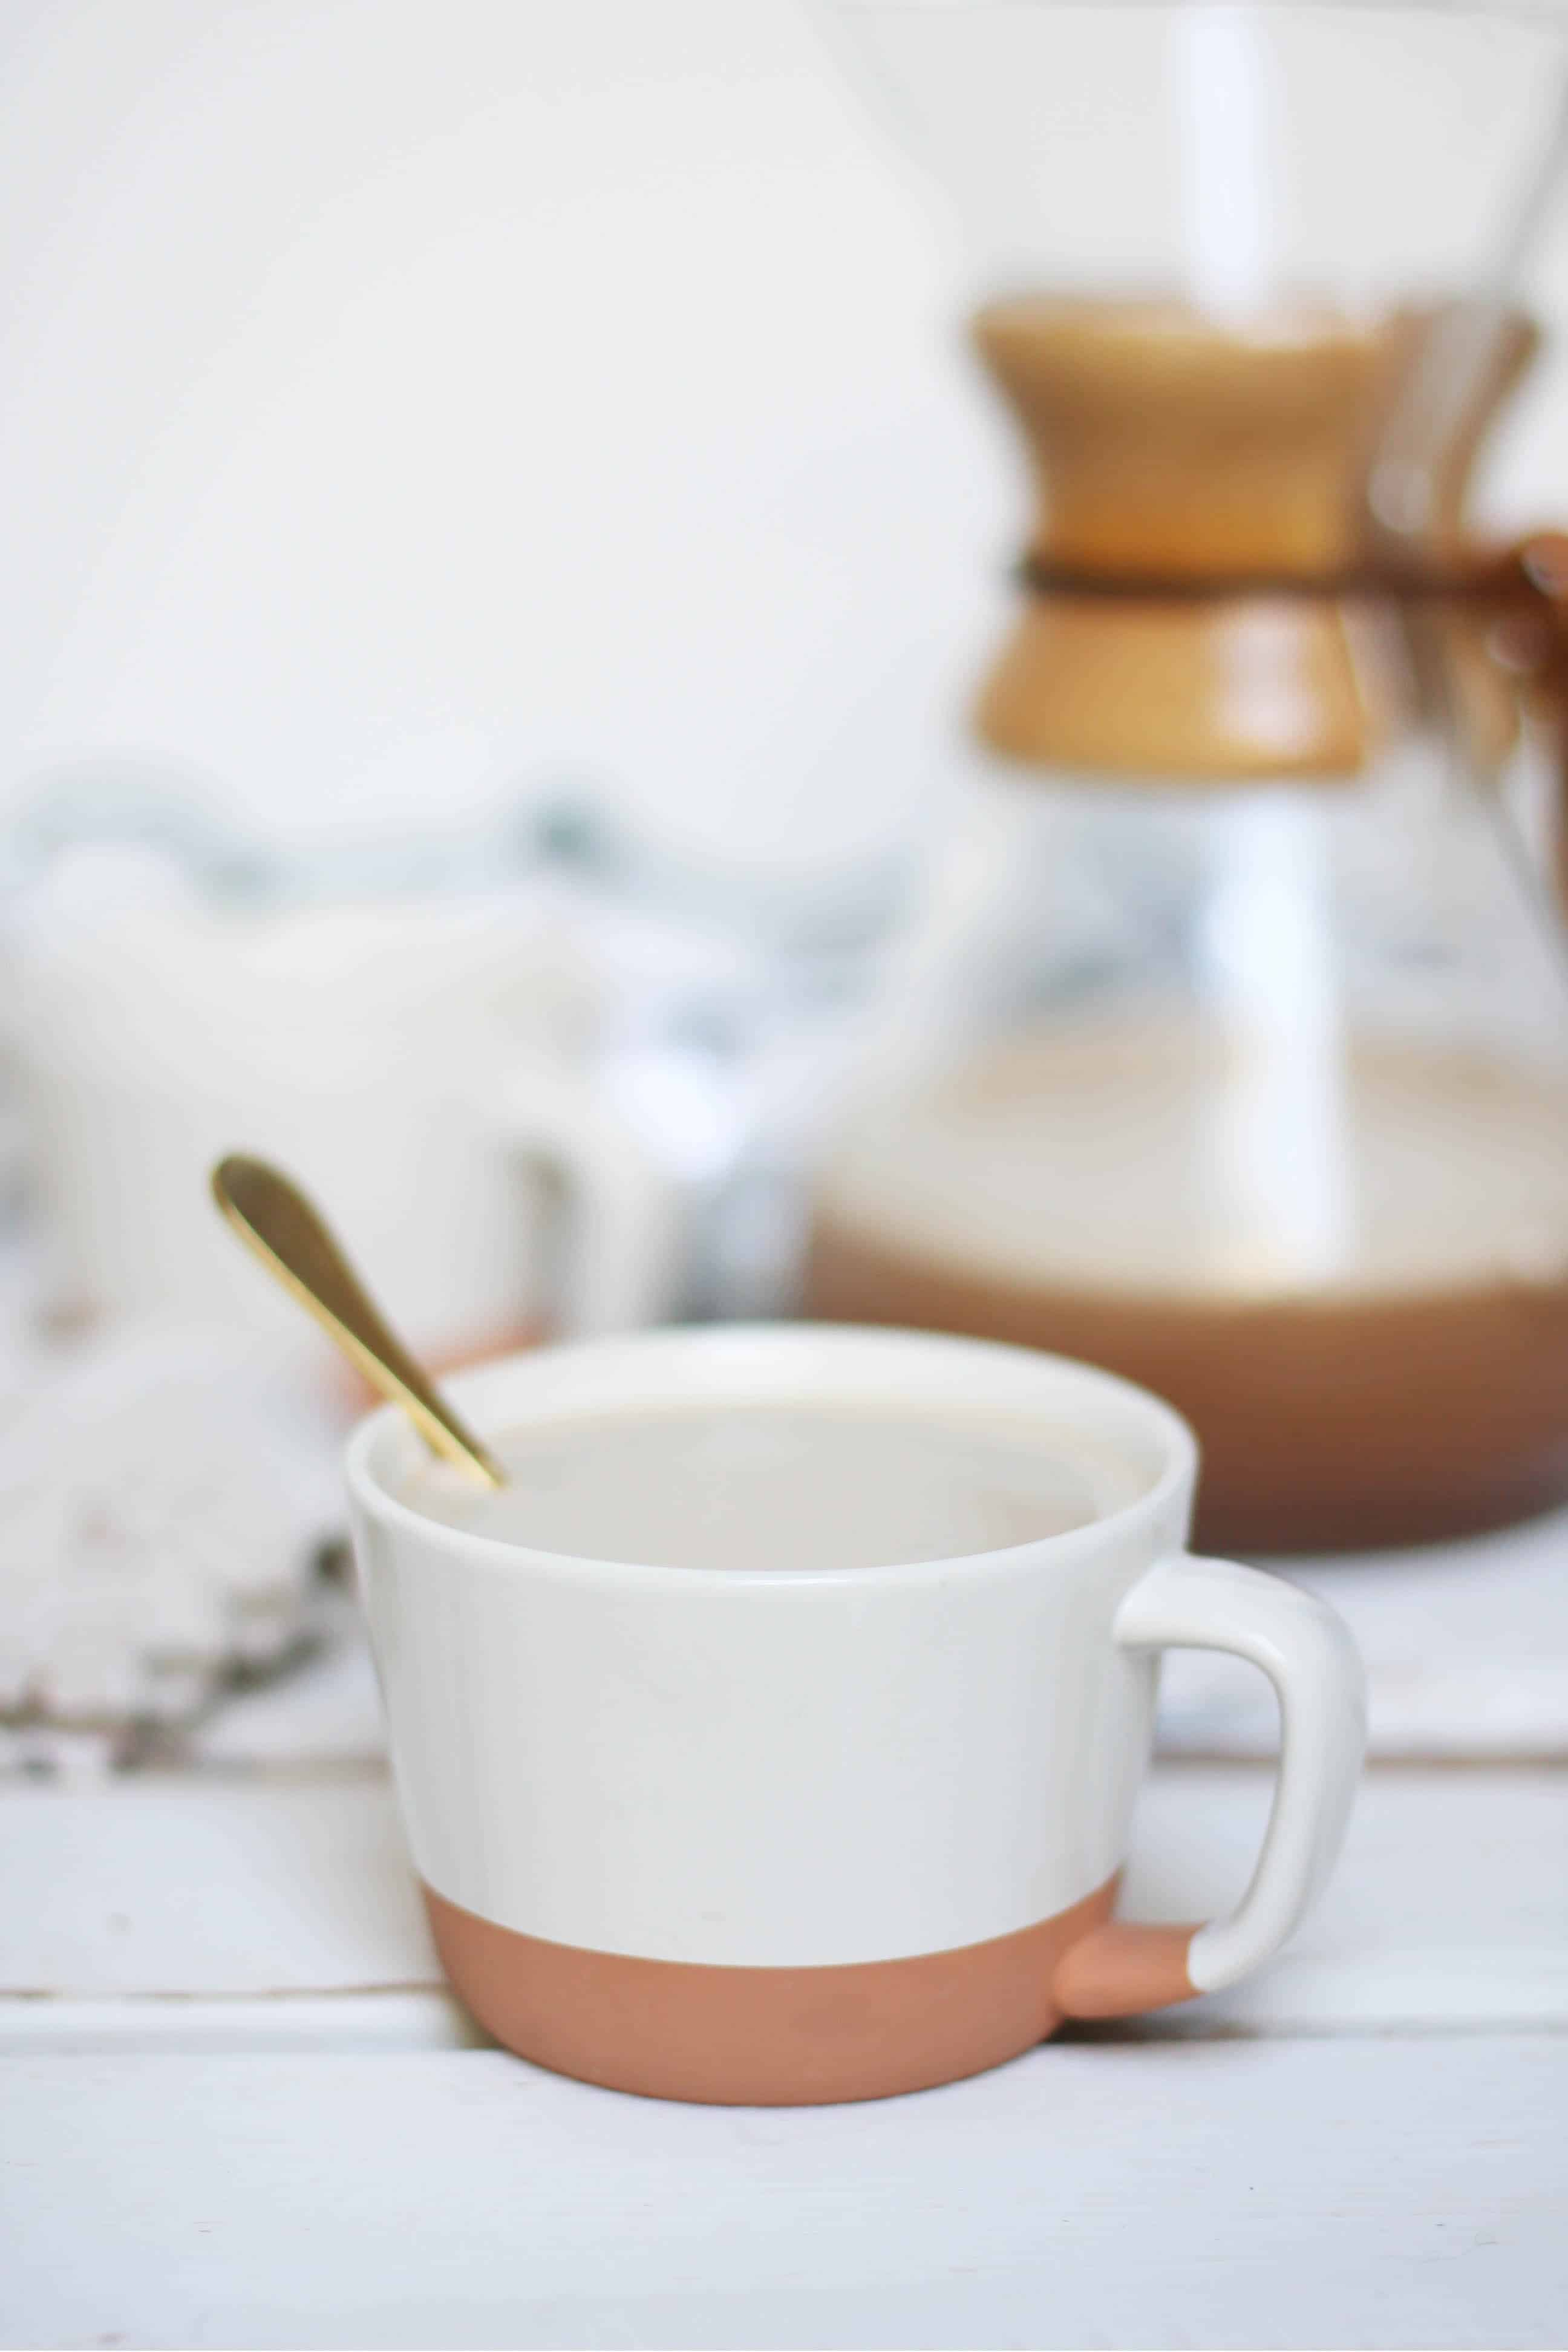 Healthy Mocha Latte - dairy free, caffeine free